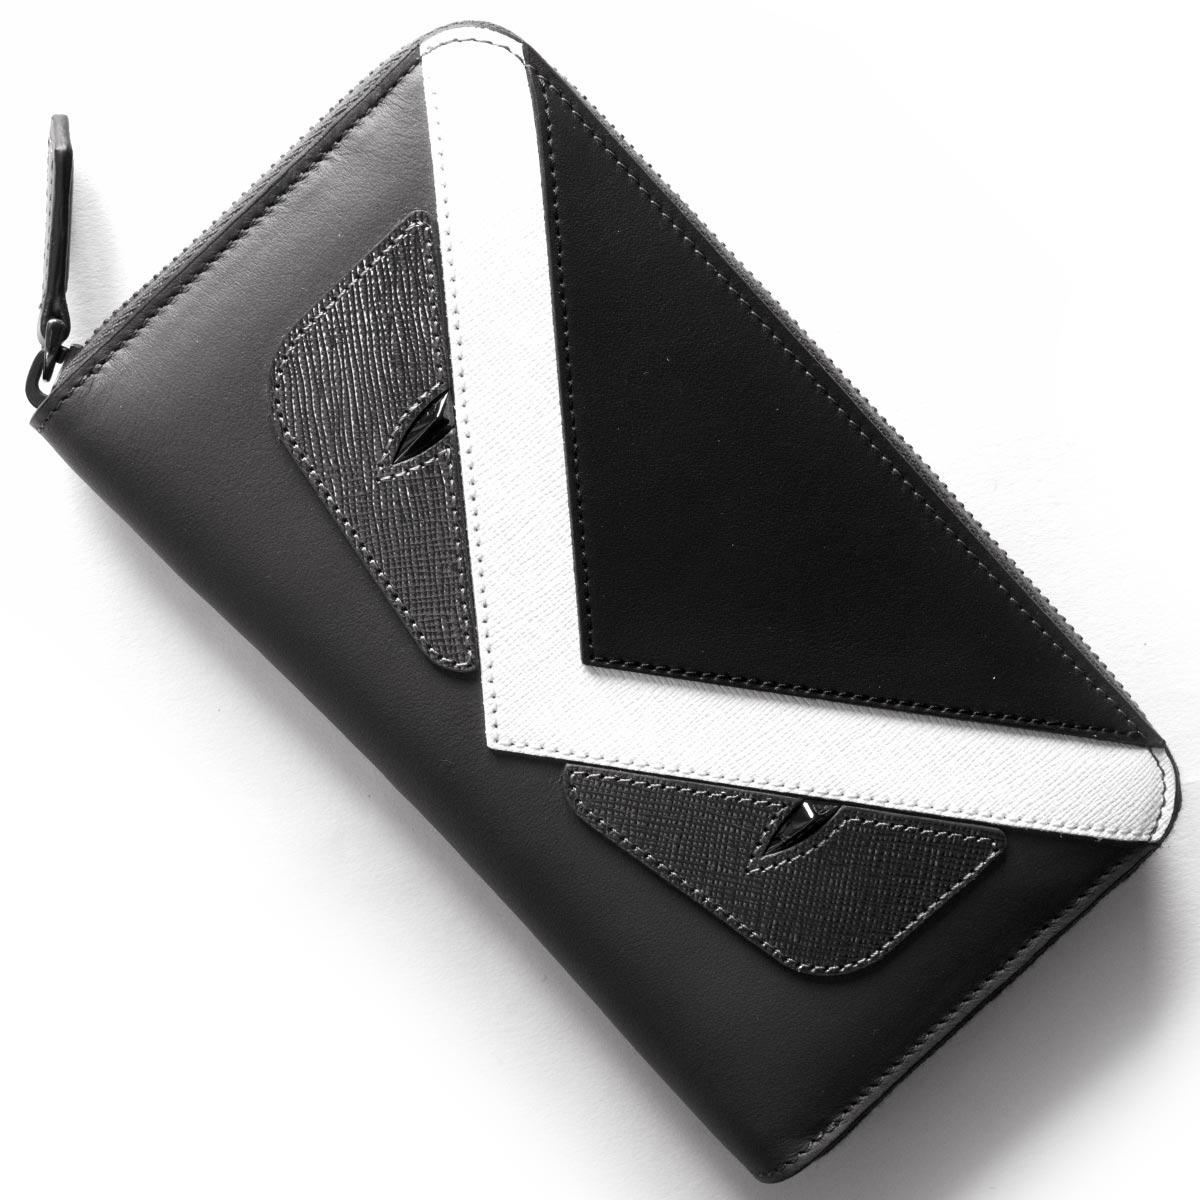 buy popular be779 480e4 フェンディ 長財布 財布 メンズ レディース モンスター MONSTER アスファルトグレー&グラファイトブラック&ホワイト 7M0210 8FJ  F06HP FENDI|ブランドショップ ブルーク